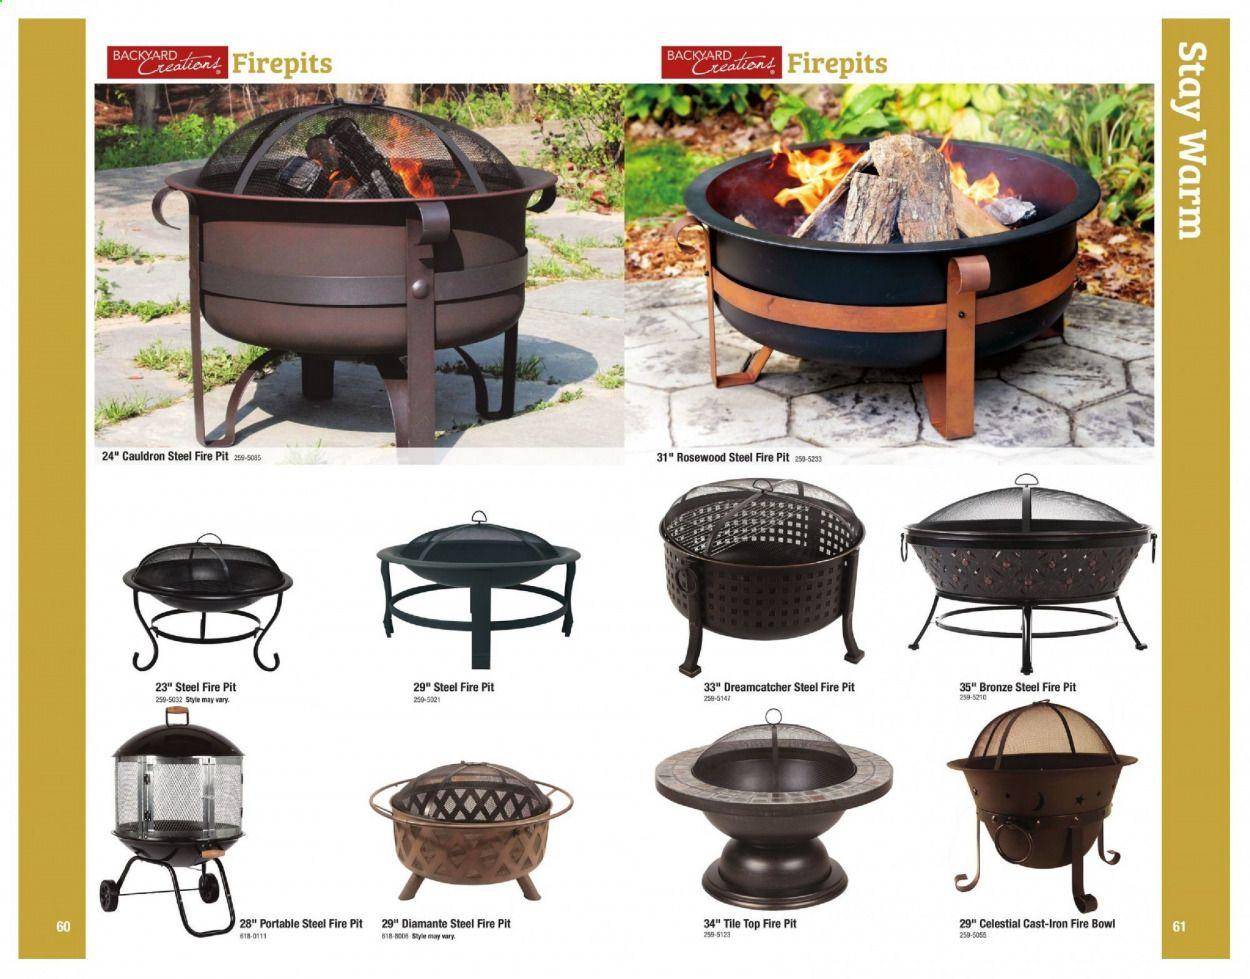 Menards Outdoor Living Catalog 2021 - Page 31